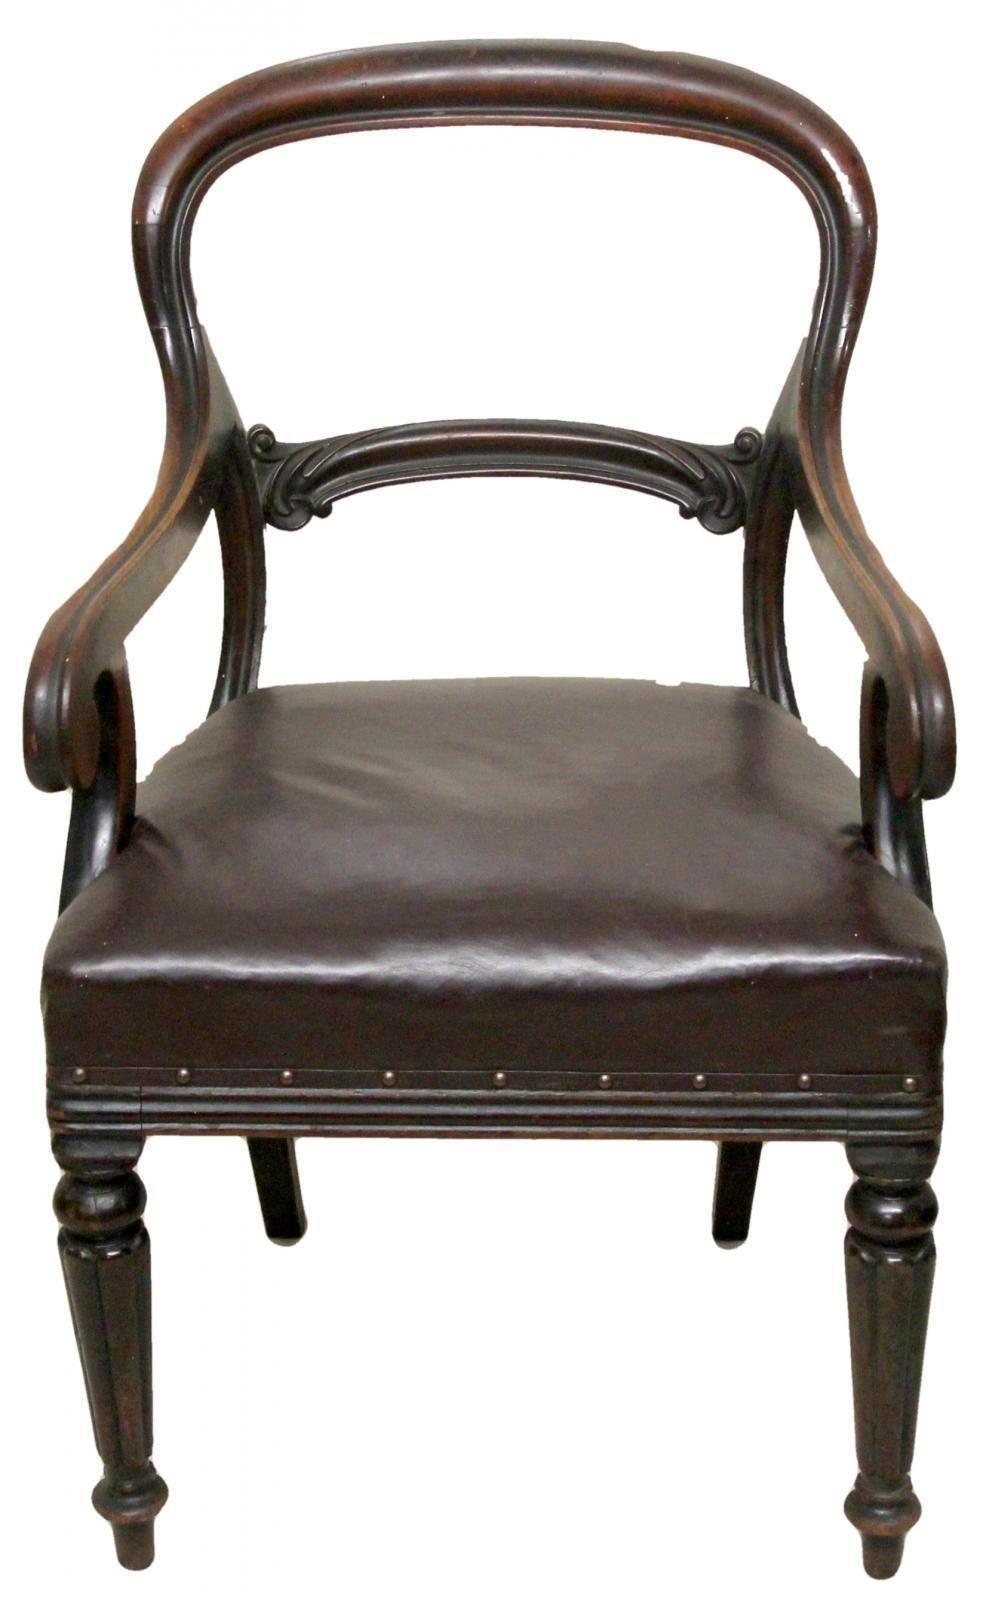 Victorian Antique Mahogany Desk Chair Victorian Desk Victorian Chair Mahogany Desk